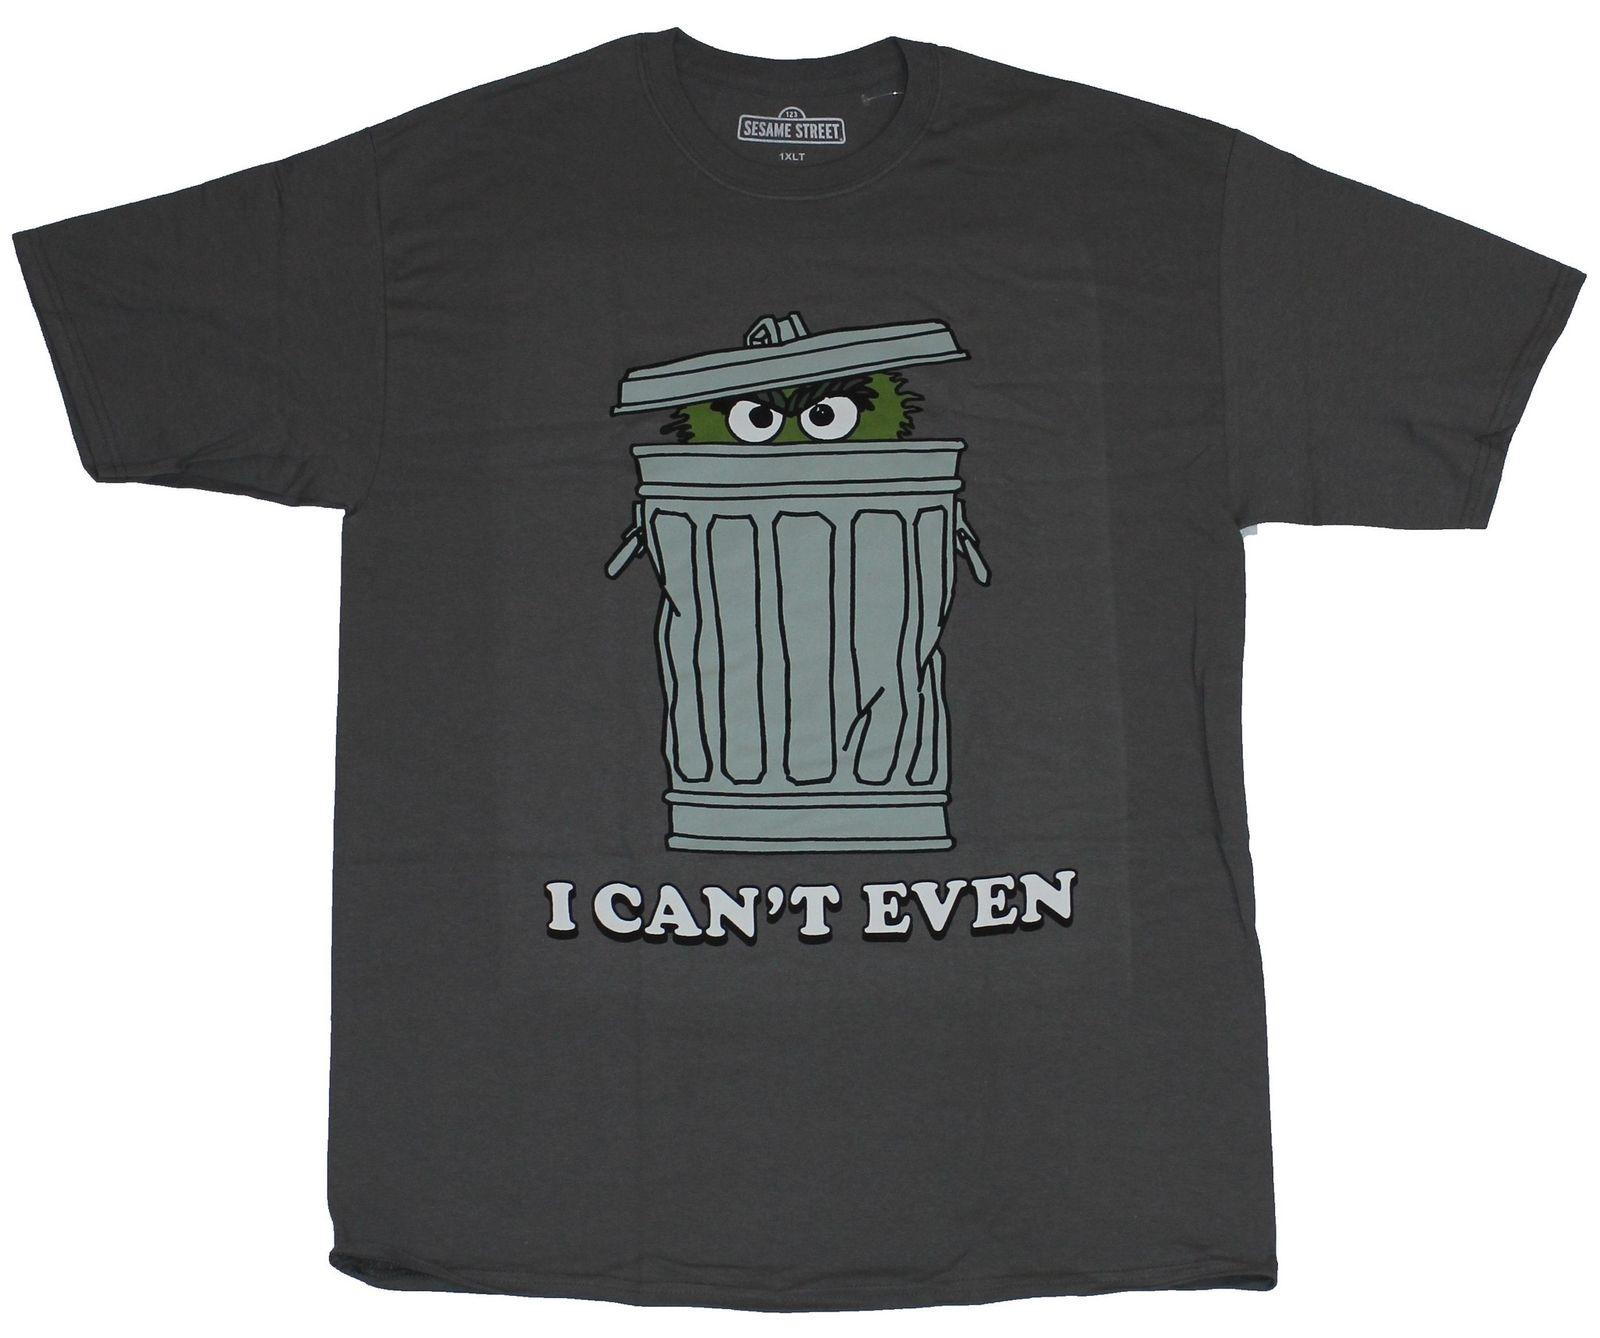 Camiseta para hombre Plaza Sésamo-Oscar The Grouch I Cant Even Hiding Can Image Cartoon camiseta para hombre Unisex nueva camiseta de moda